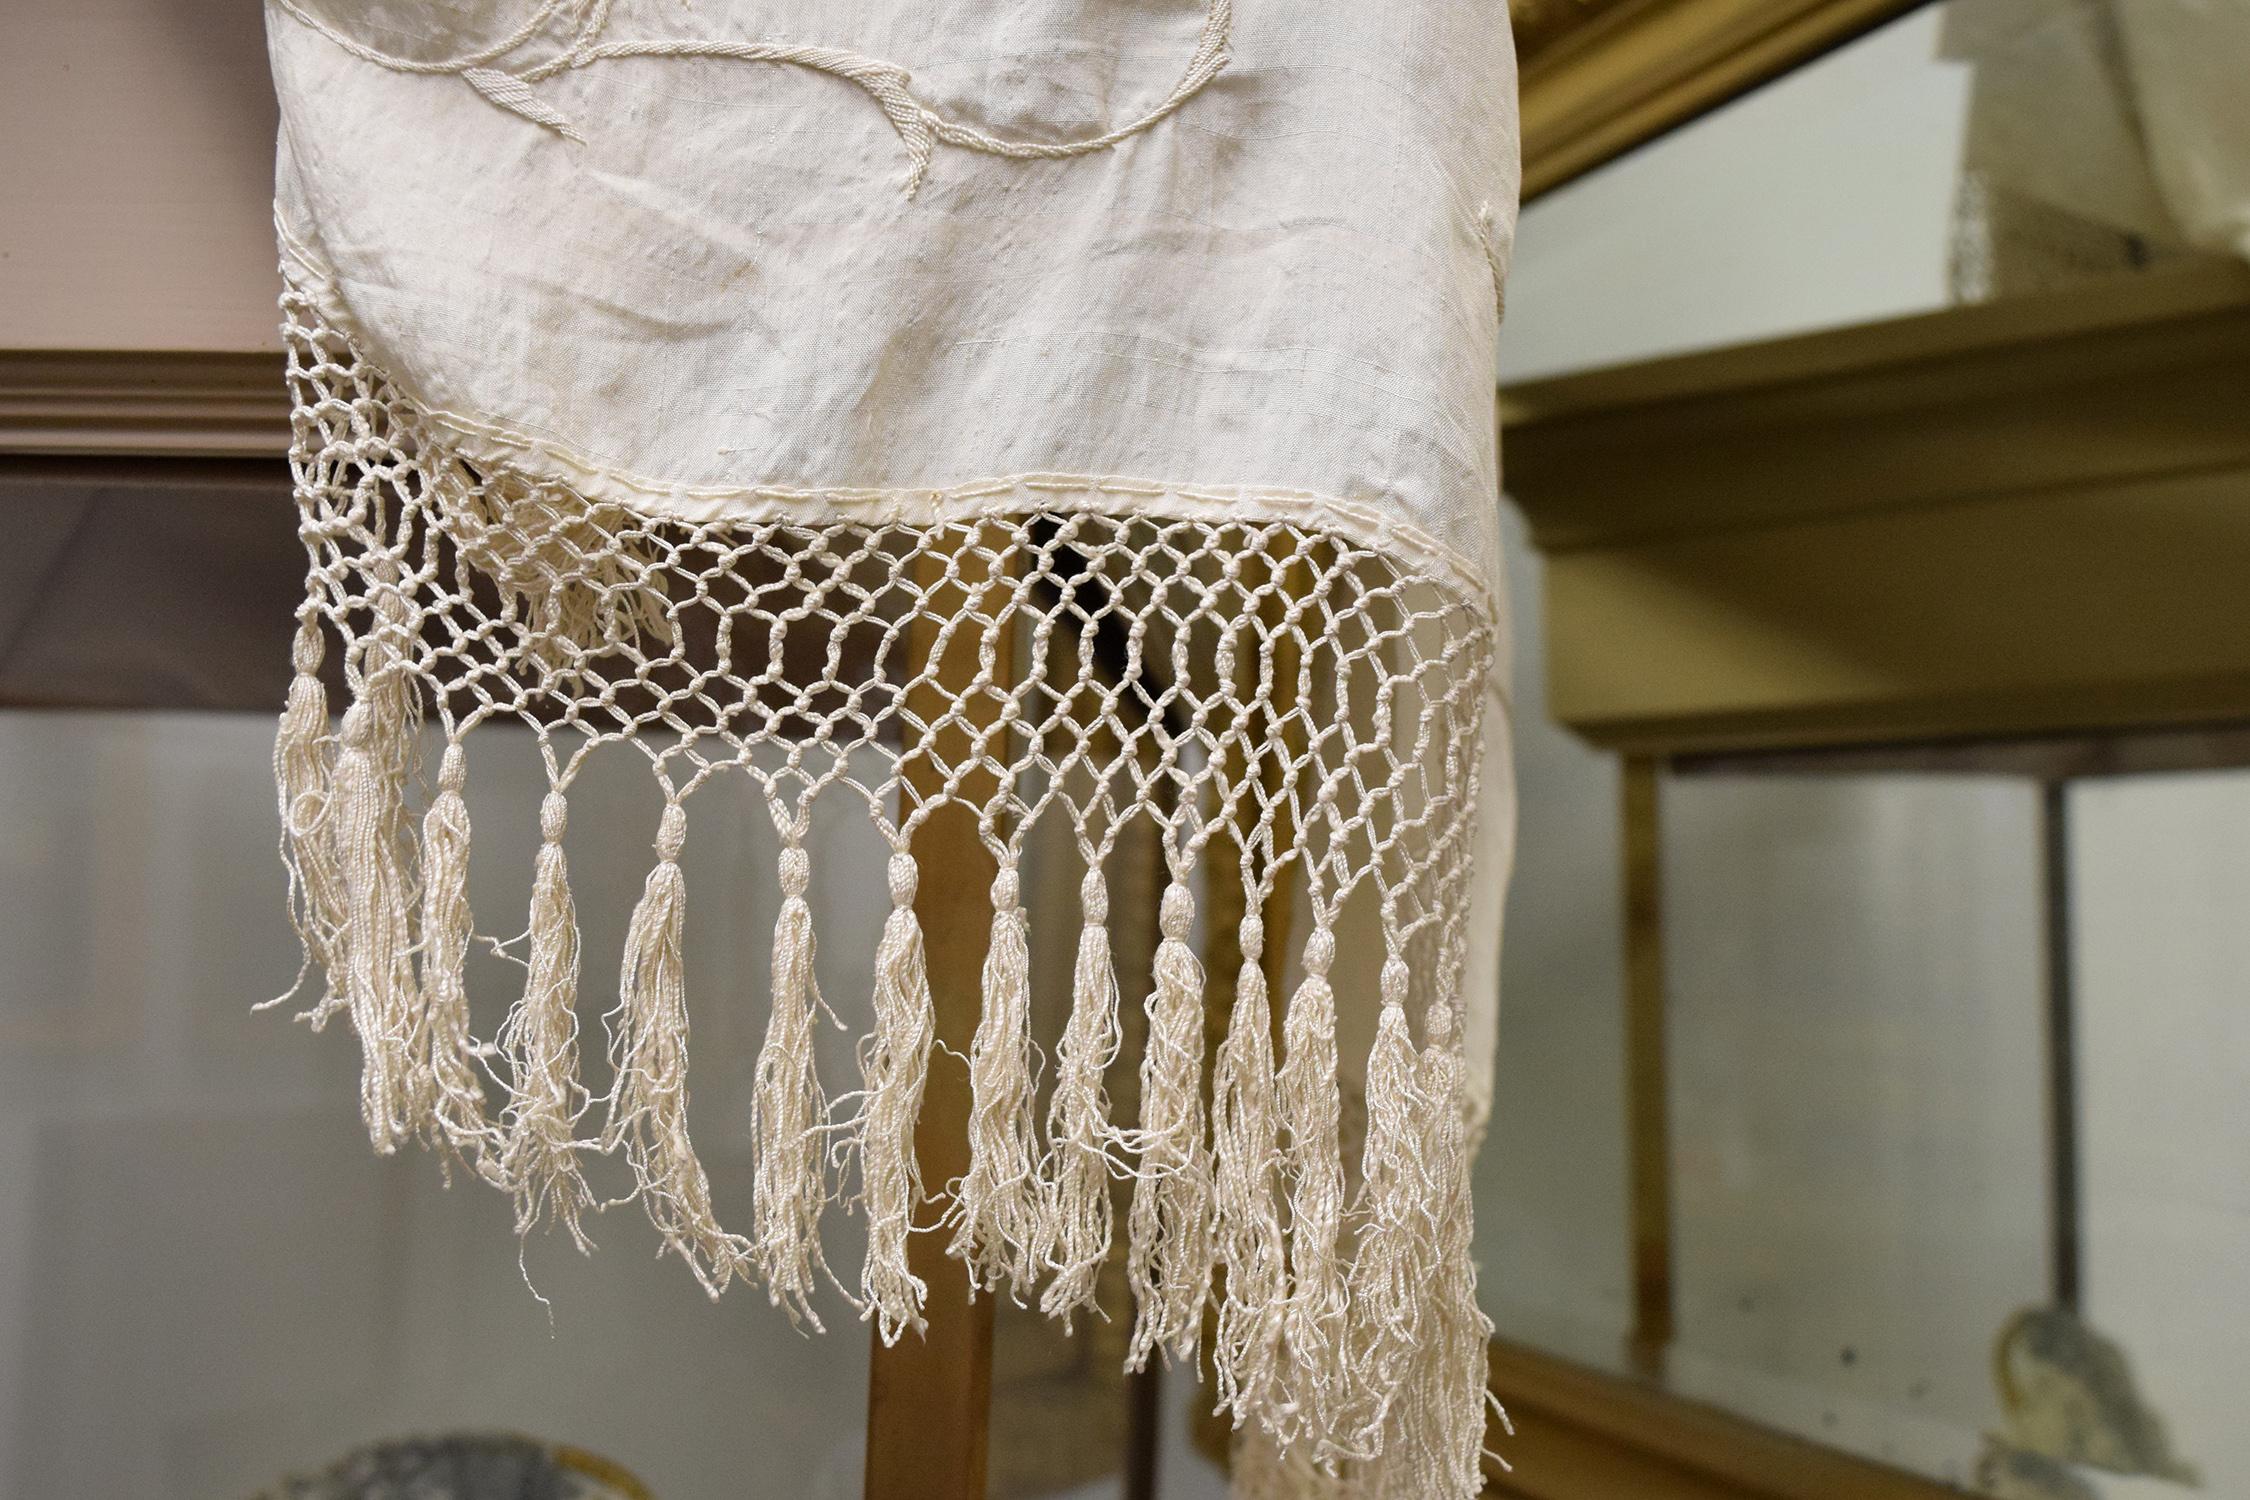 cloth1.jpg